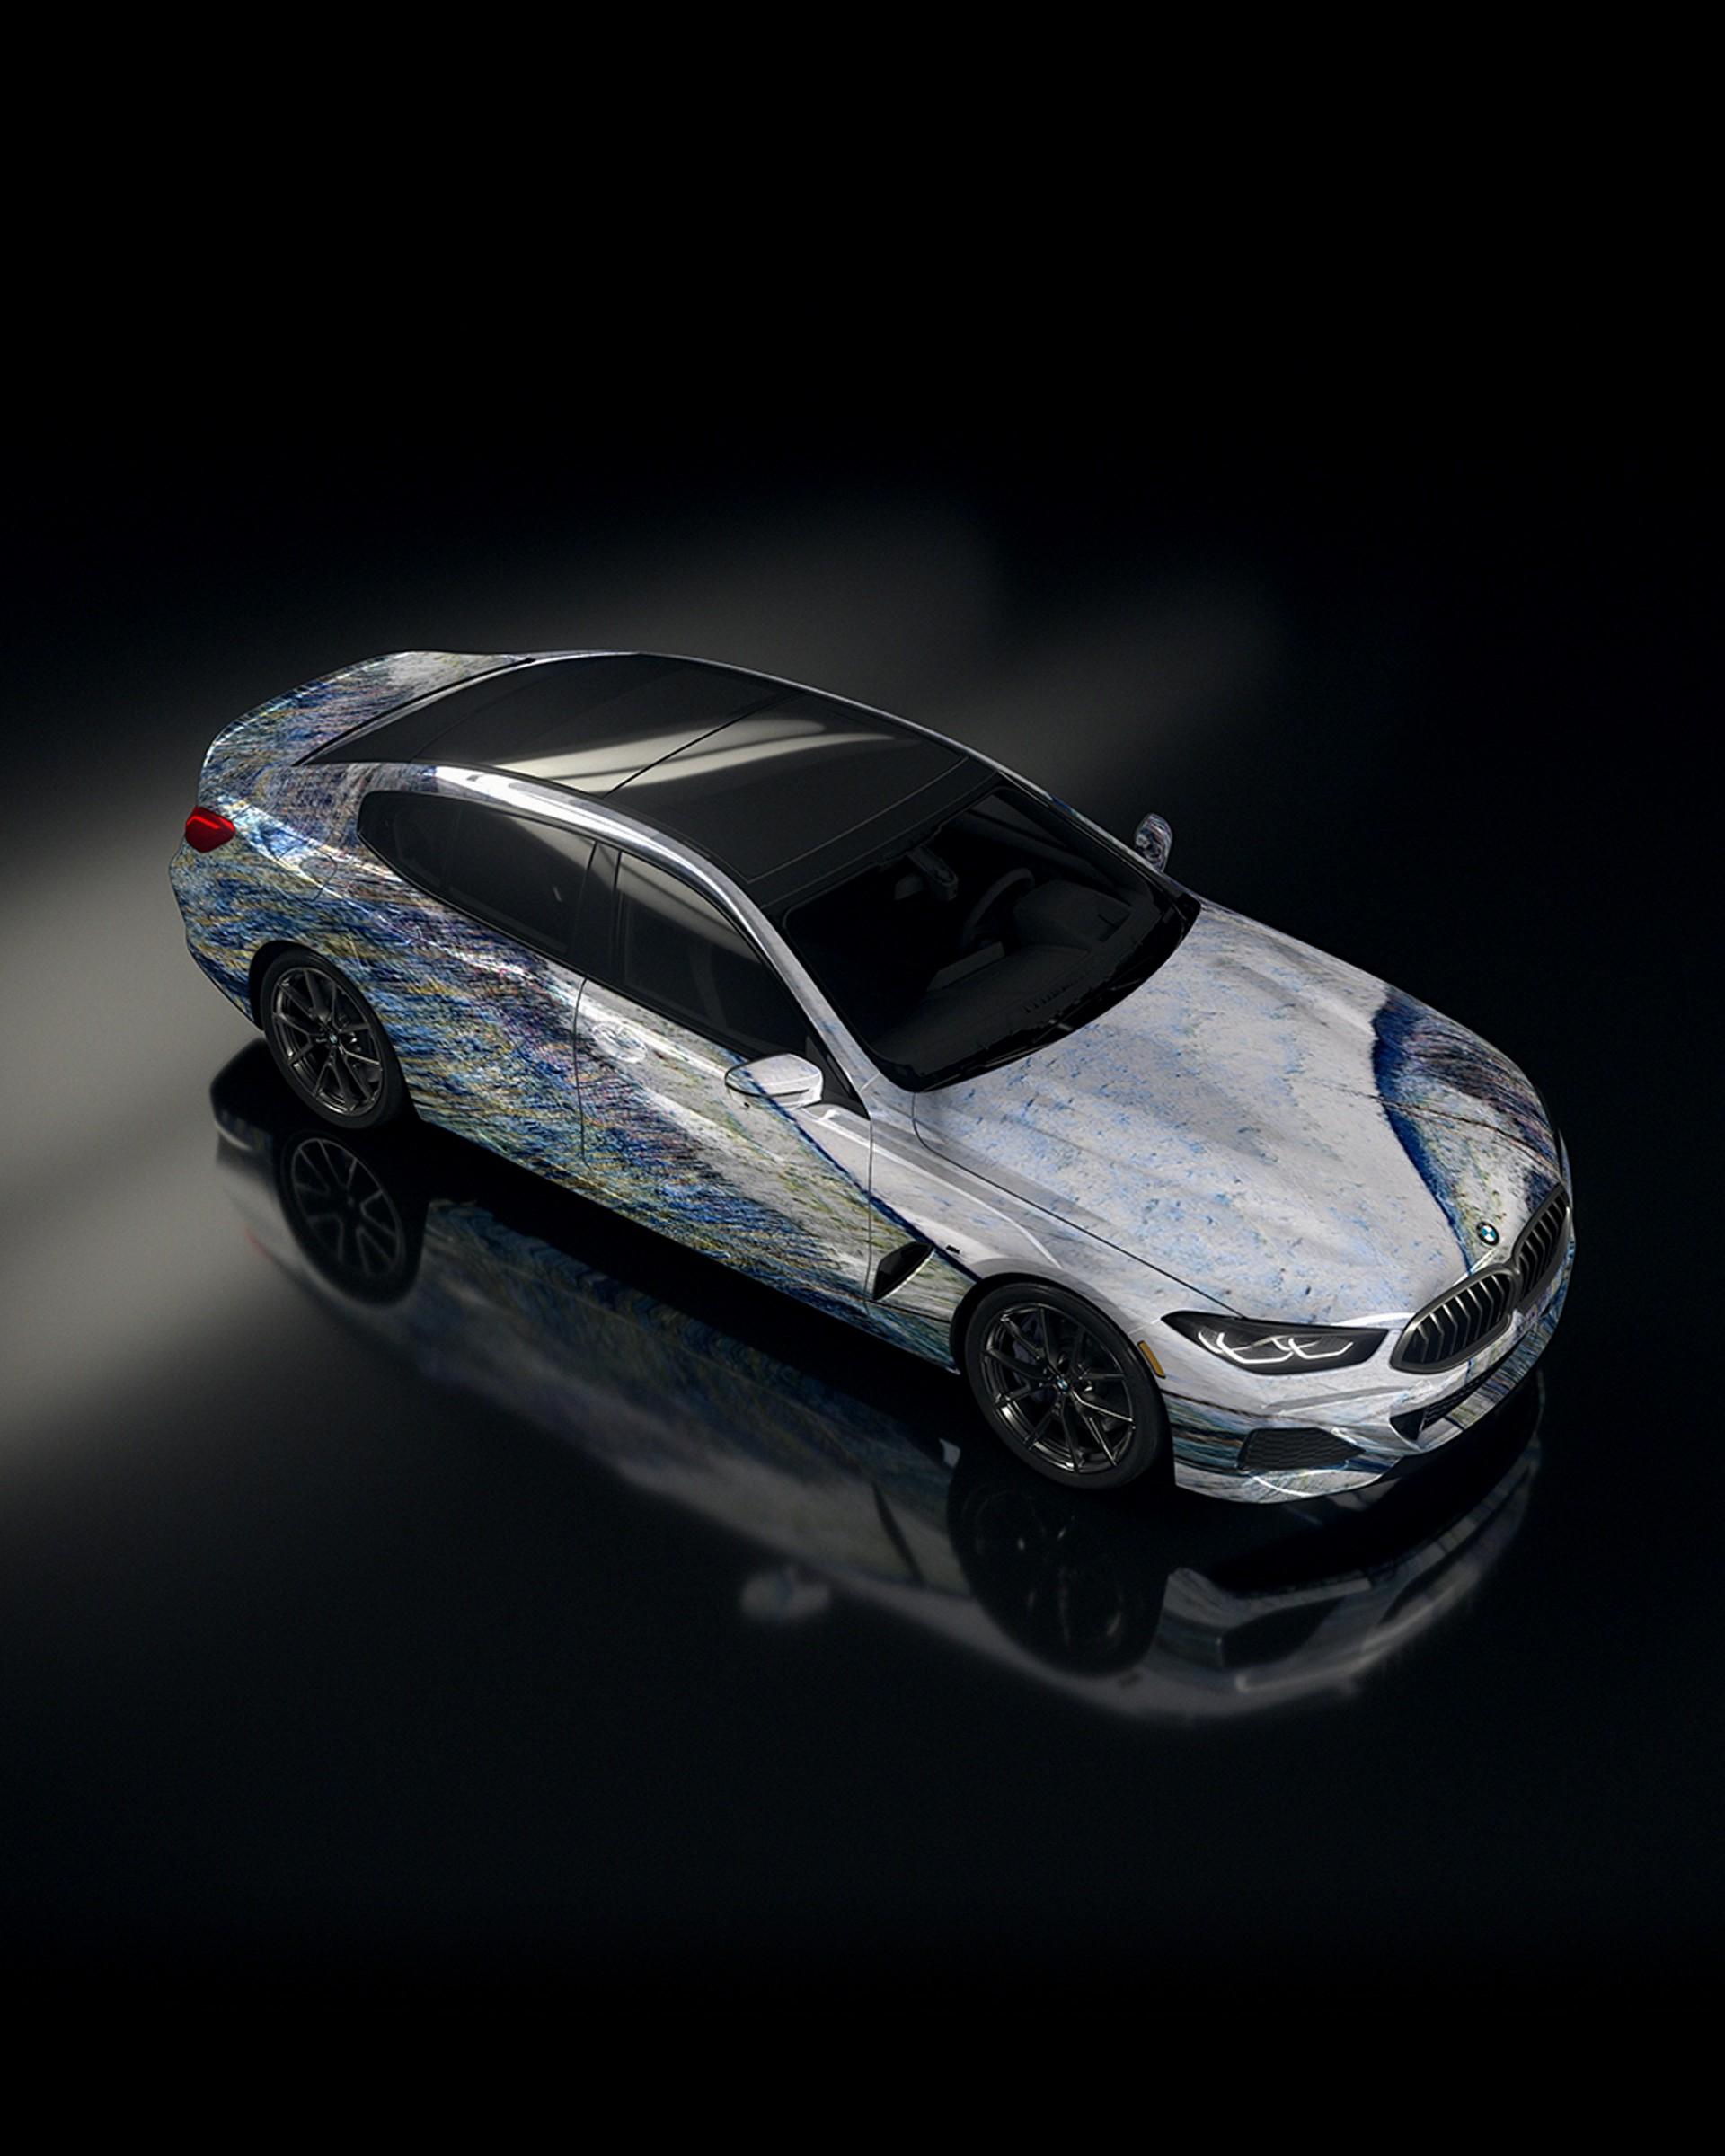 BMW-8-Series-Gran-Coupe-art-car-10